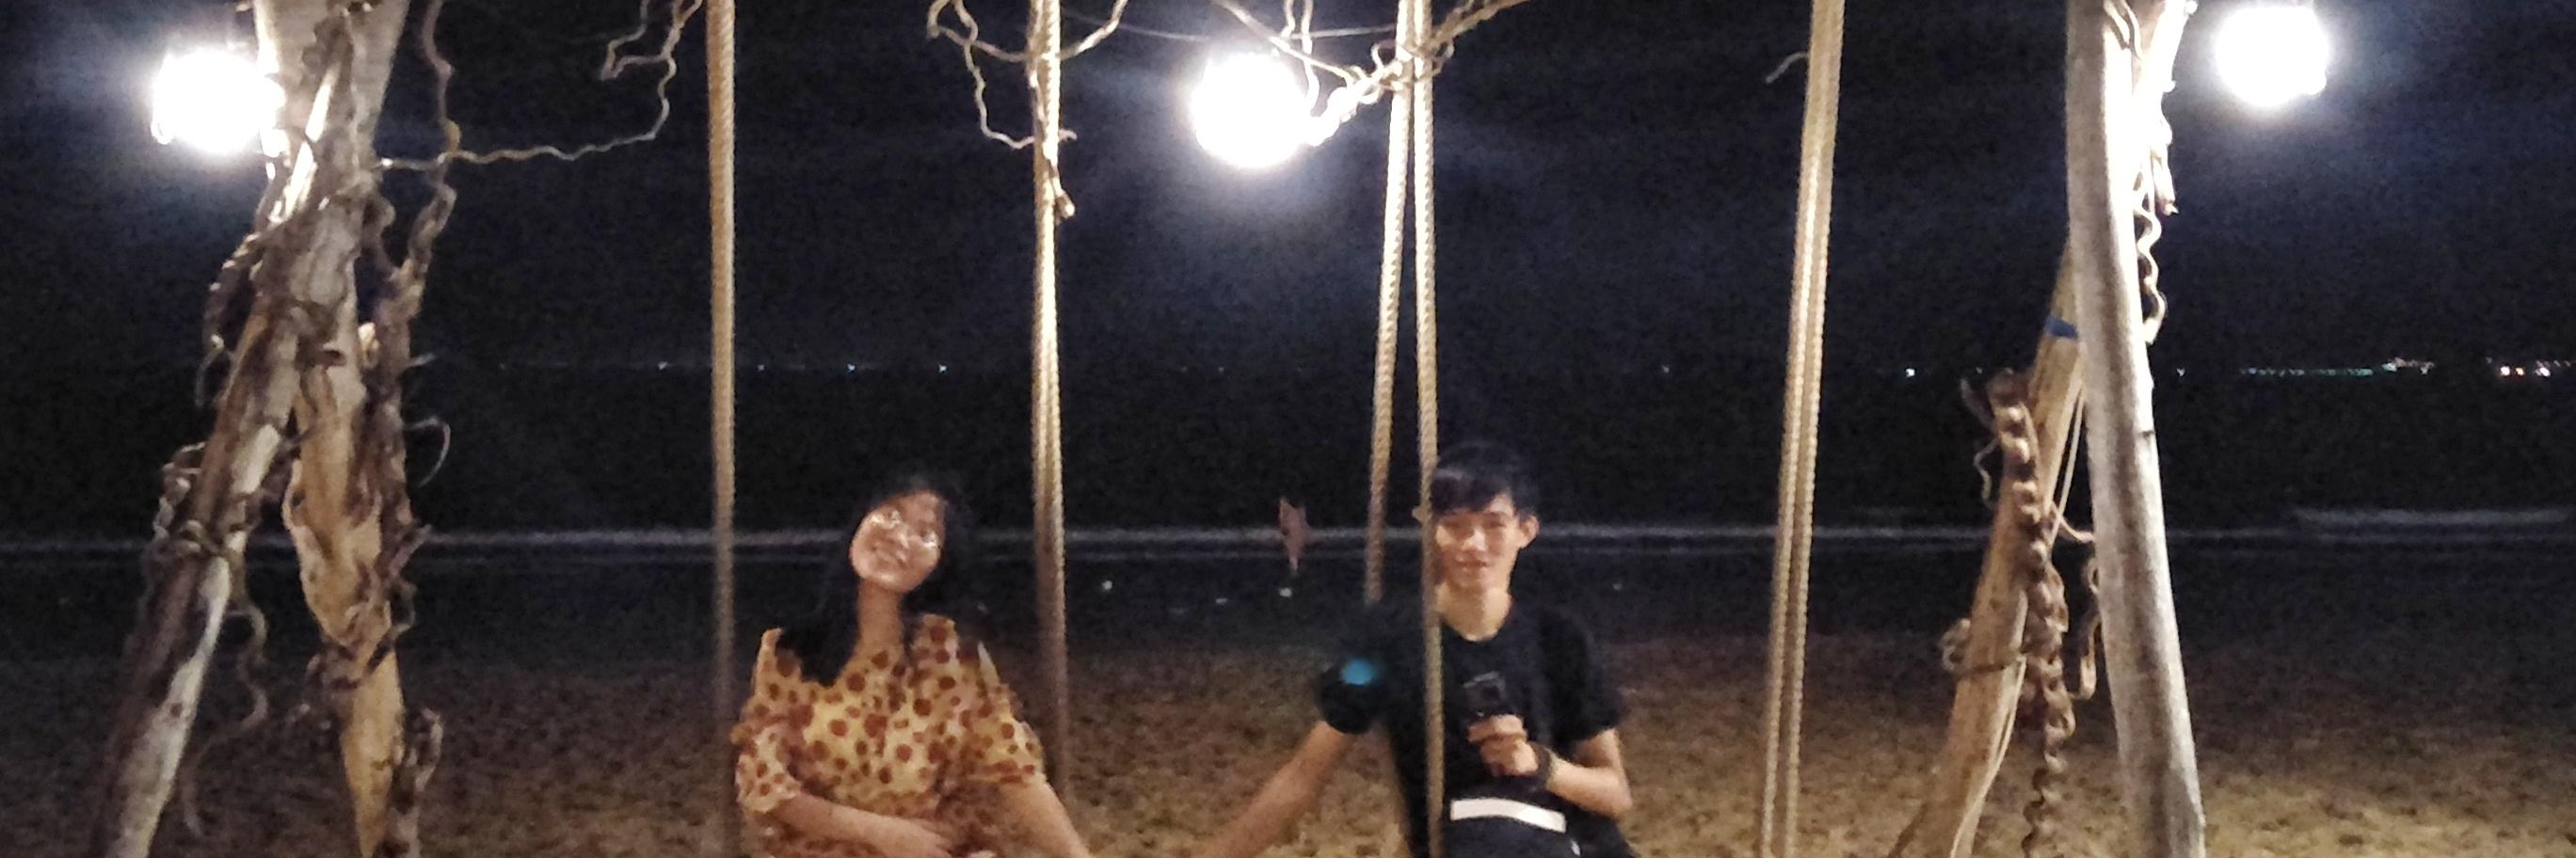 https://gody.vn/blog/datto56989593/post/quy-nhon-binh-dinh-5866